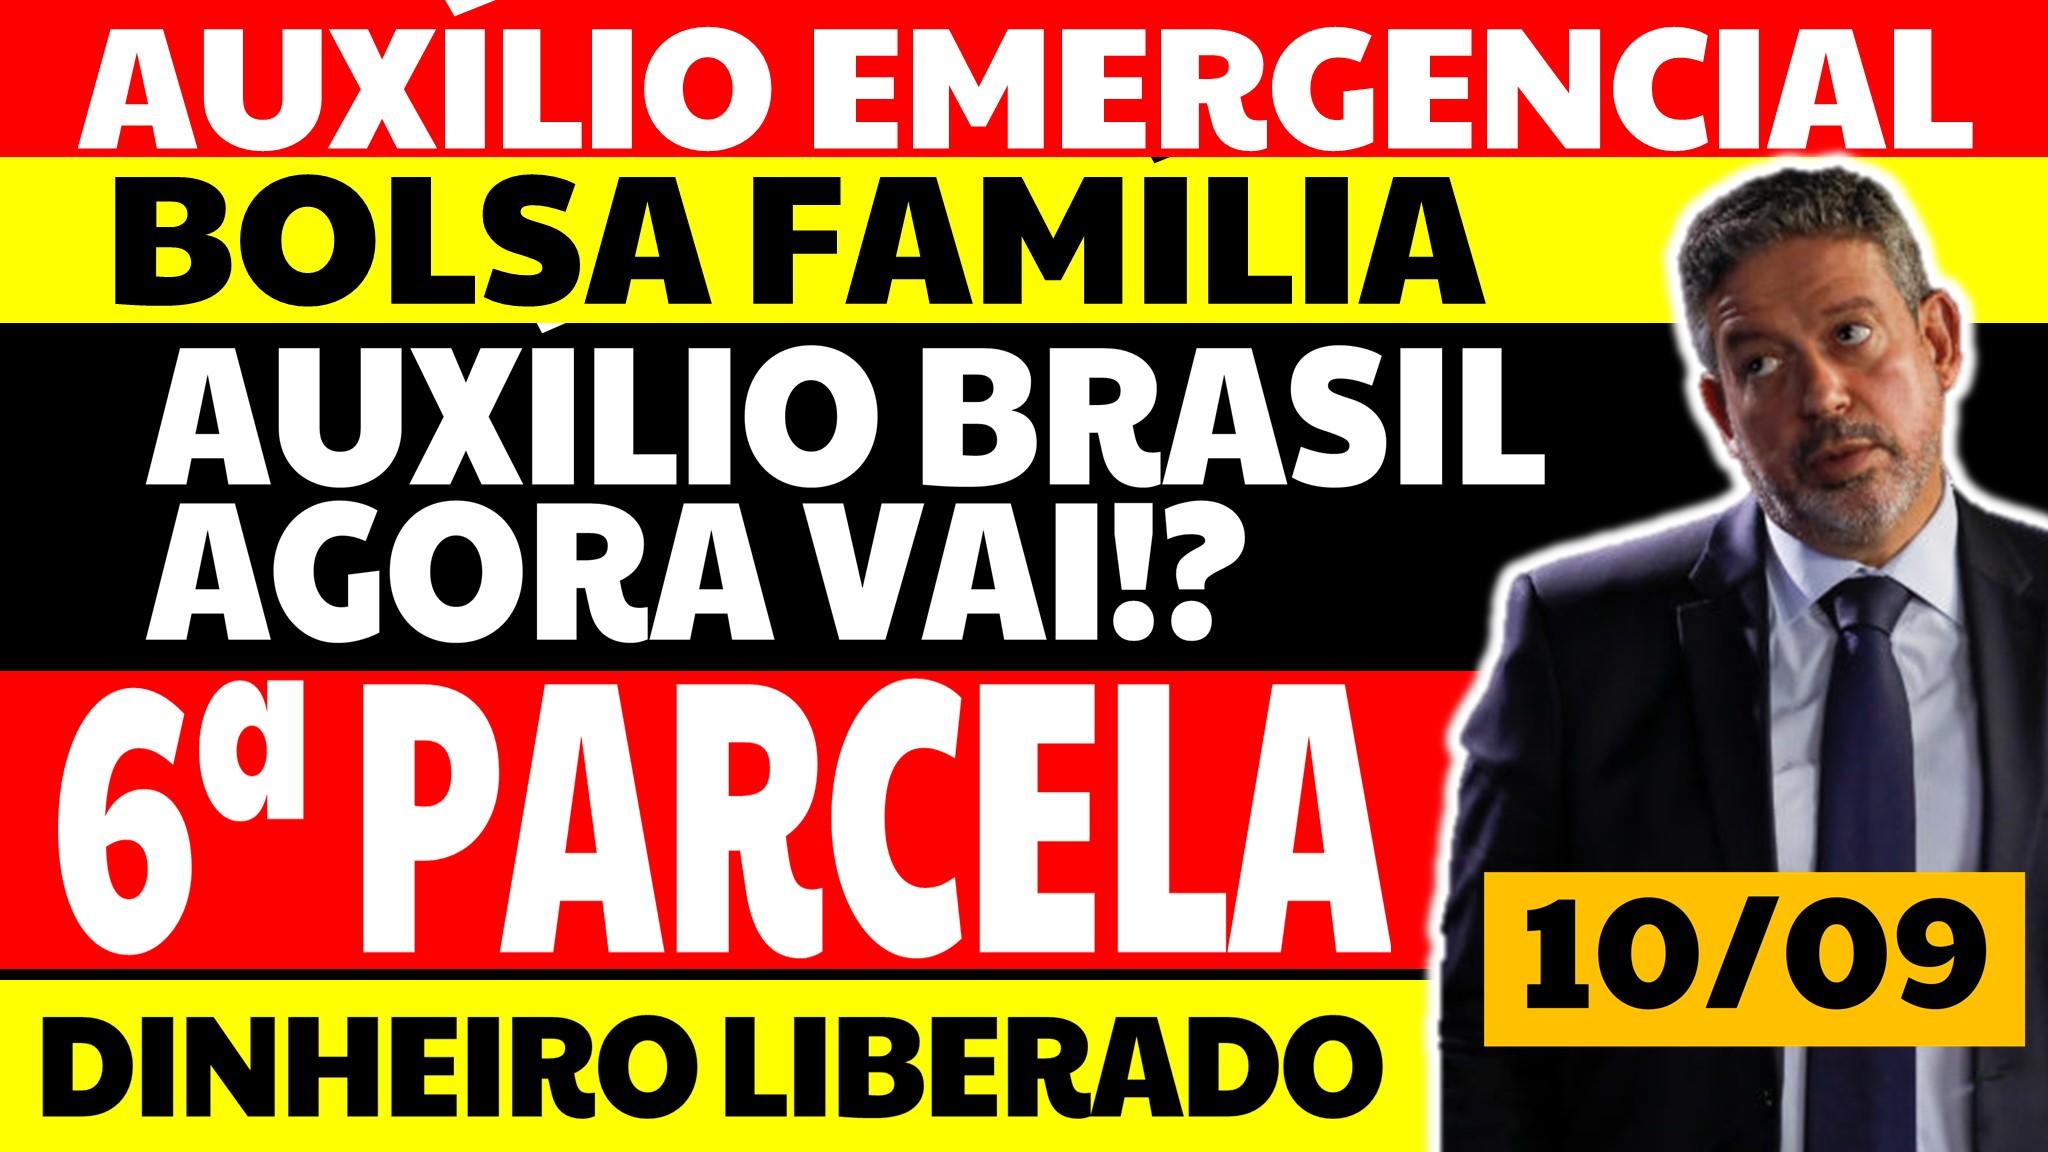 Read more about the article Auxílio Emergencial Hoje – 10/09